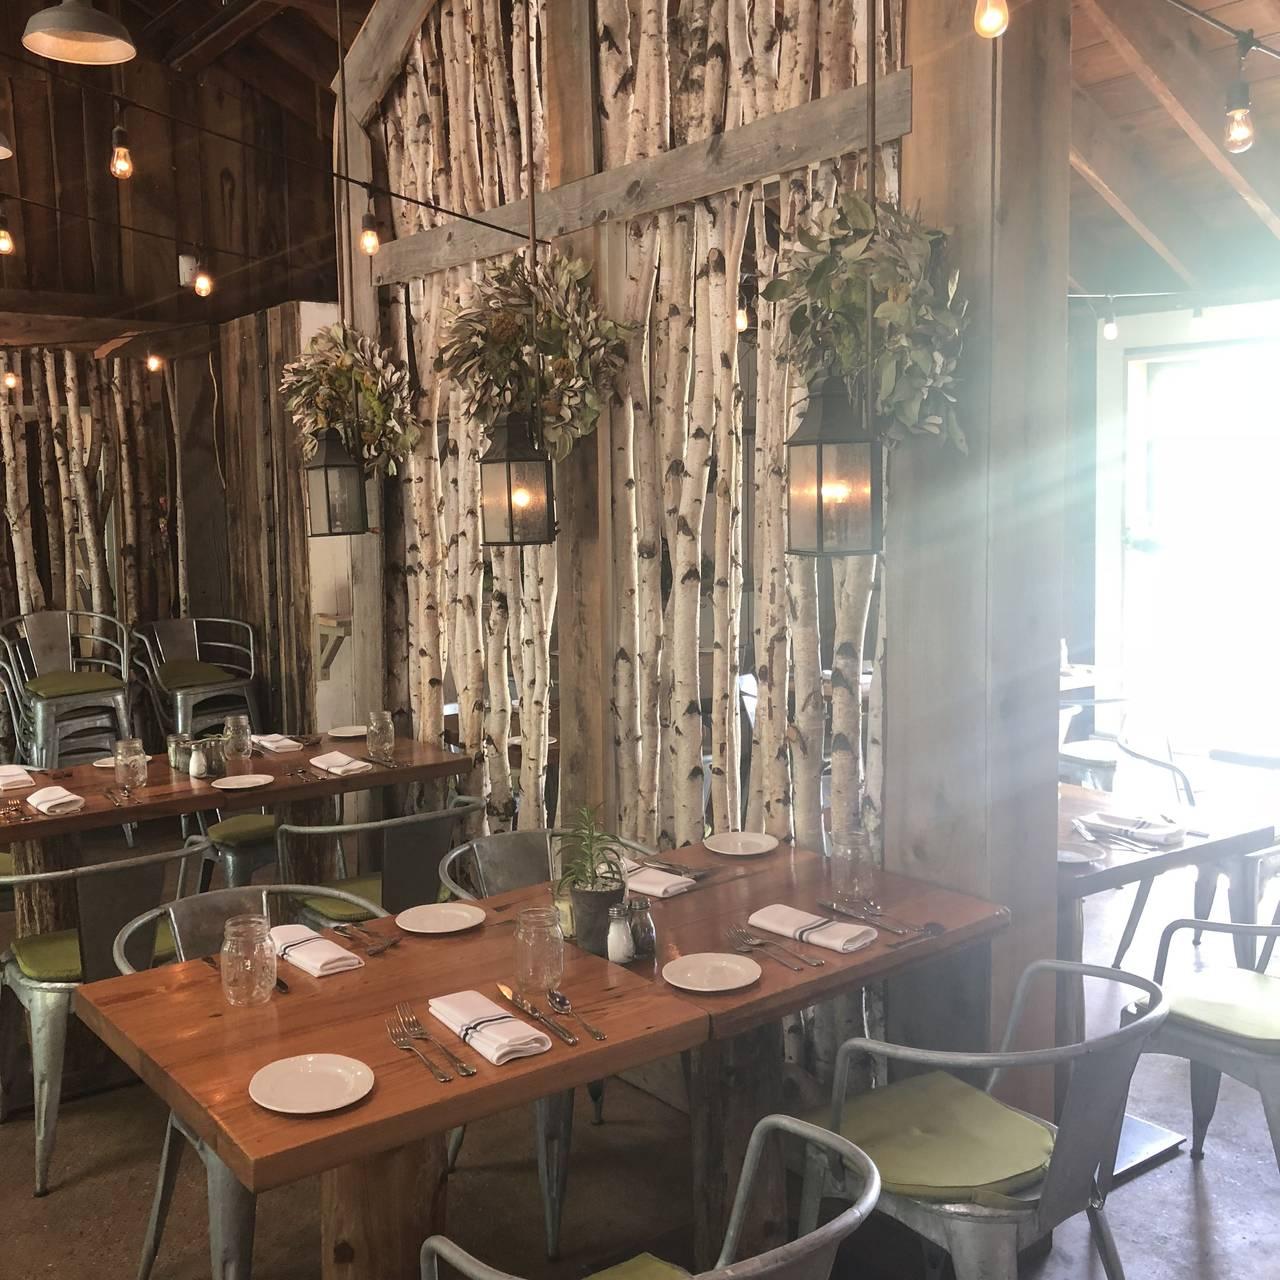 Terrain Garden Cafe Restaurant - Glen Mills, PA | OpenTable